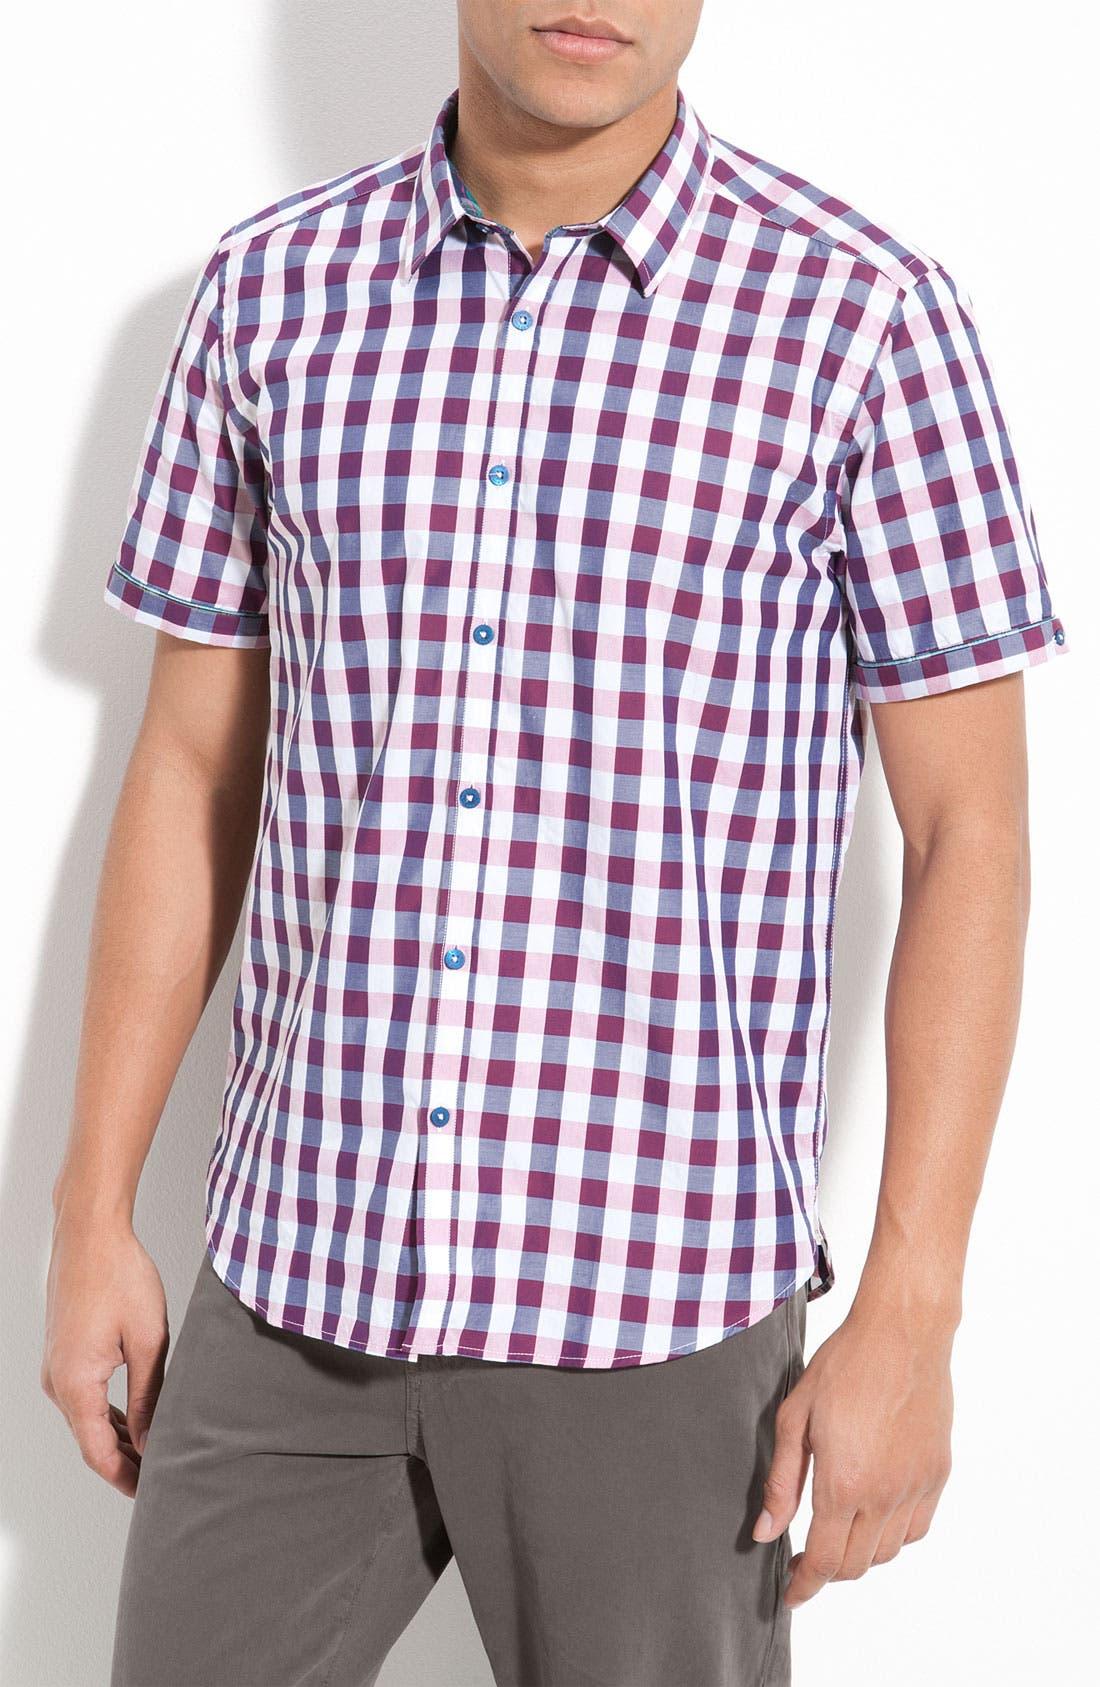 Main Image - Ted Baker London Check Plaid Woven Shirt